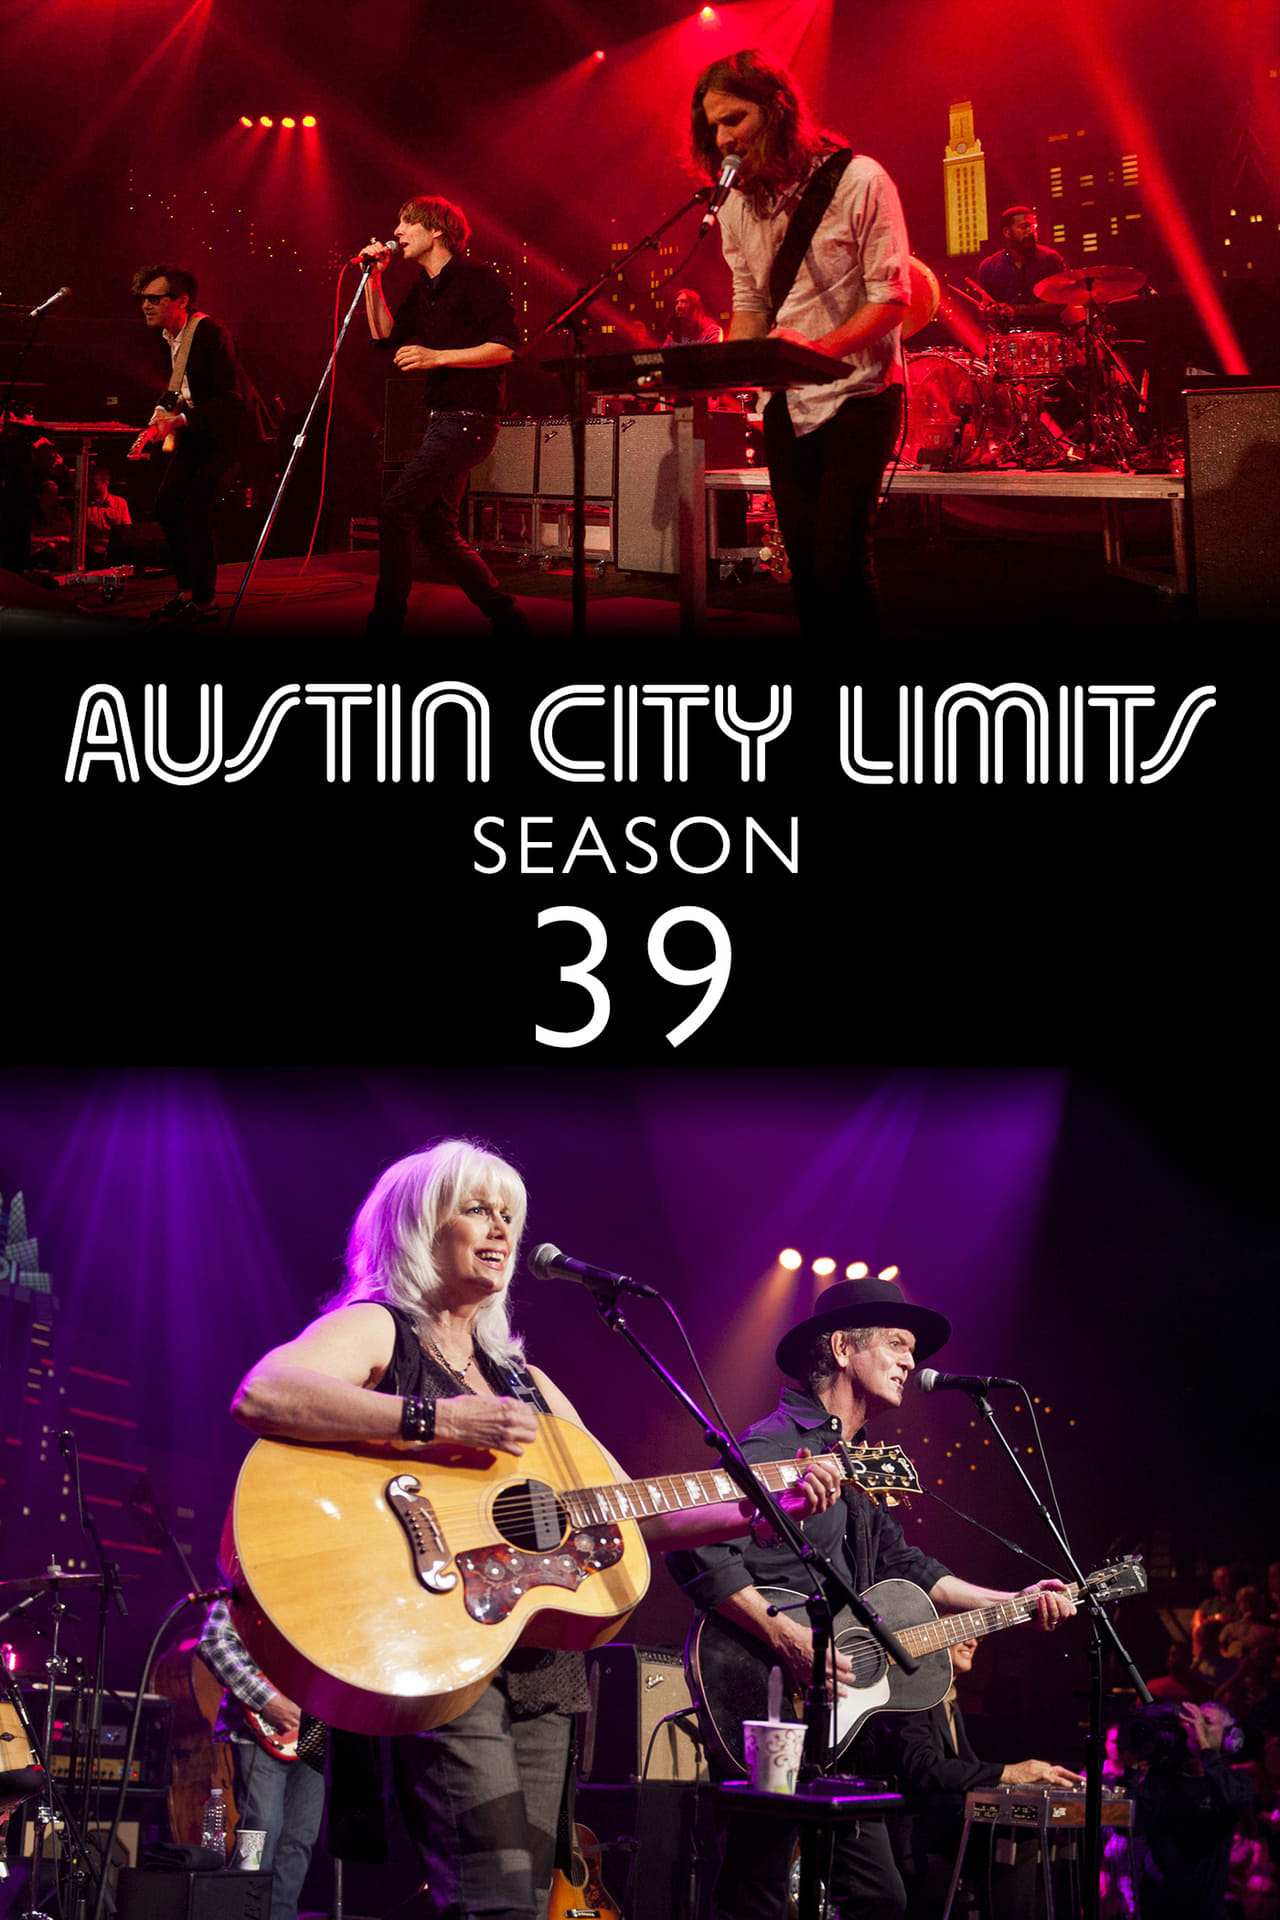 Austin City Limits Season 39 (2013) putlockers cafe